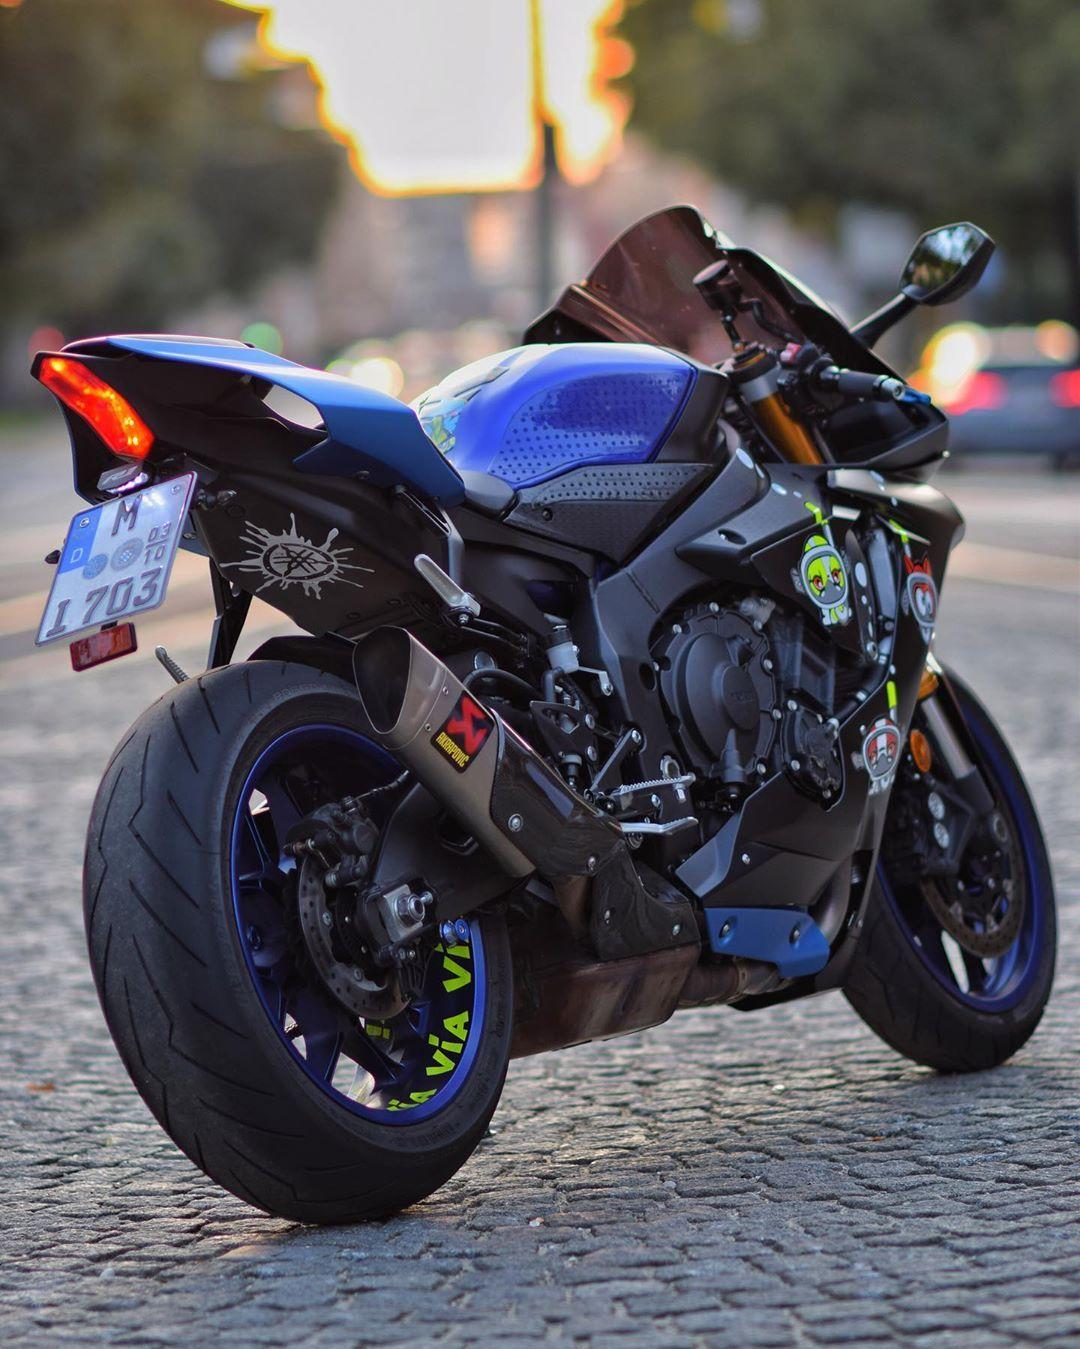 Yamaha R1 Rn49 On Instagram Via Via Via Do We Have Here Valeyellow46 Fans R1 Agv Yamaga Super Bikes Yamaha Bikes Enduro Motocross